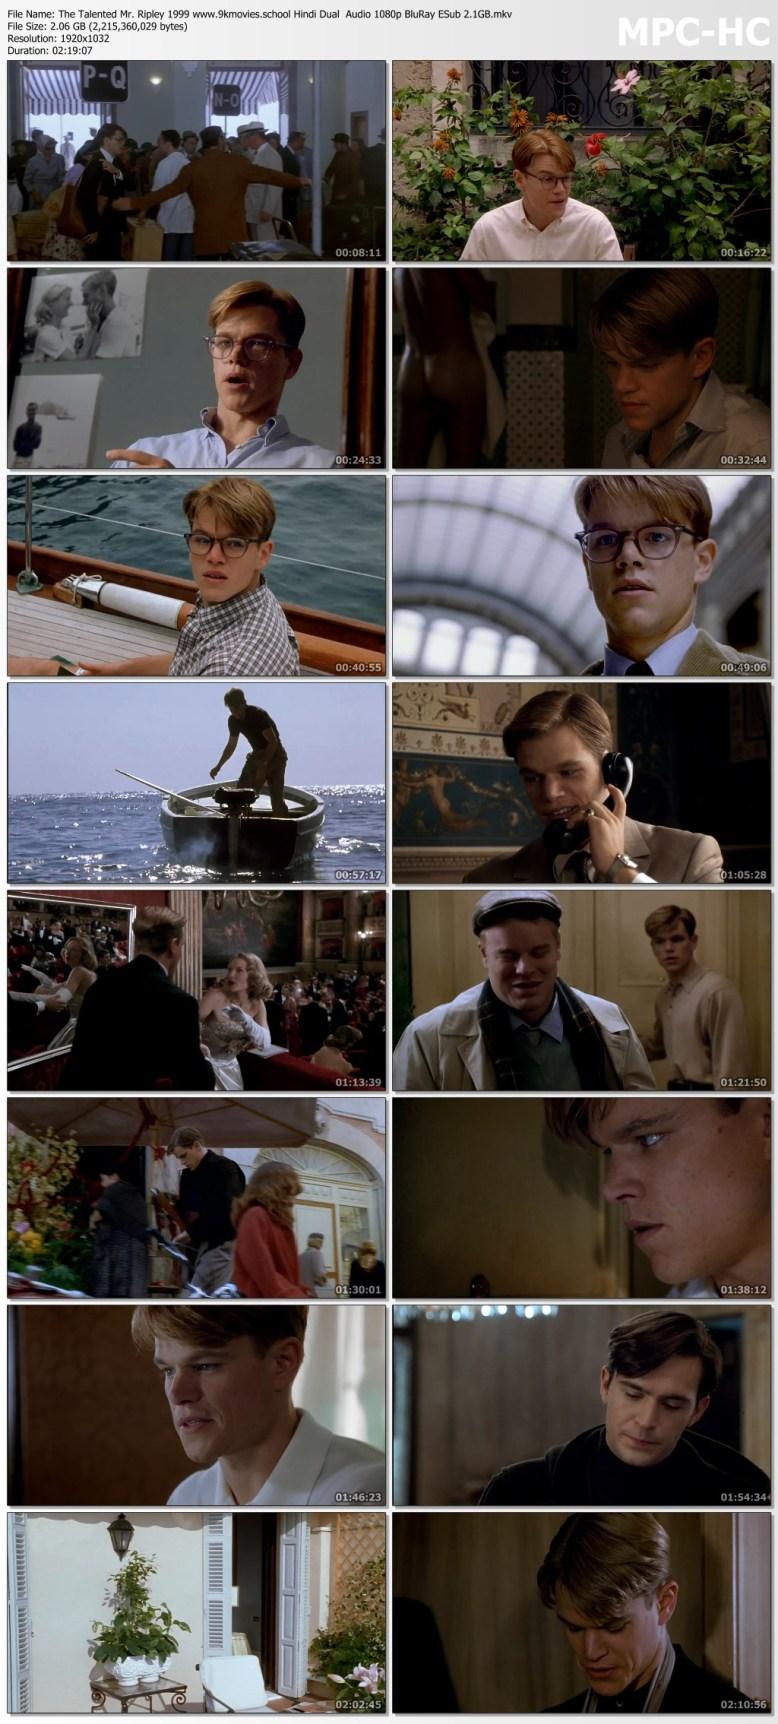 Download The Talented Mr. Ripley 1999 Hindi Dual Audio 1080p BluRay ESub 2.1GB